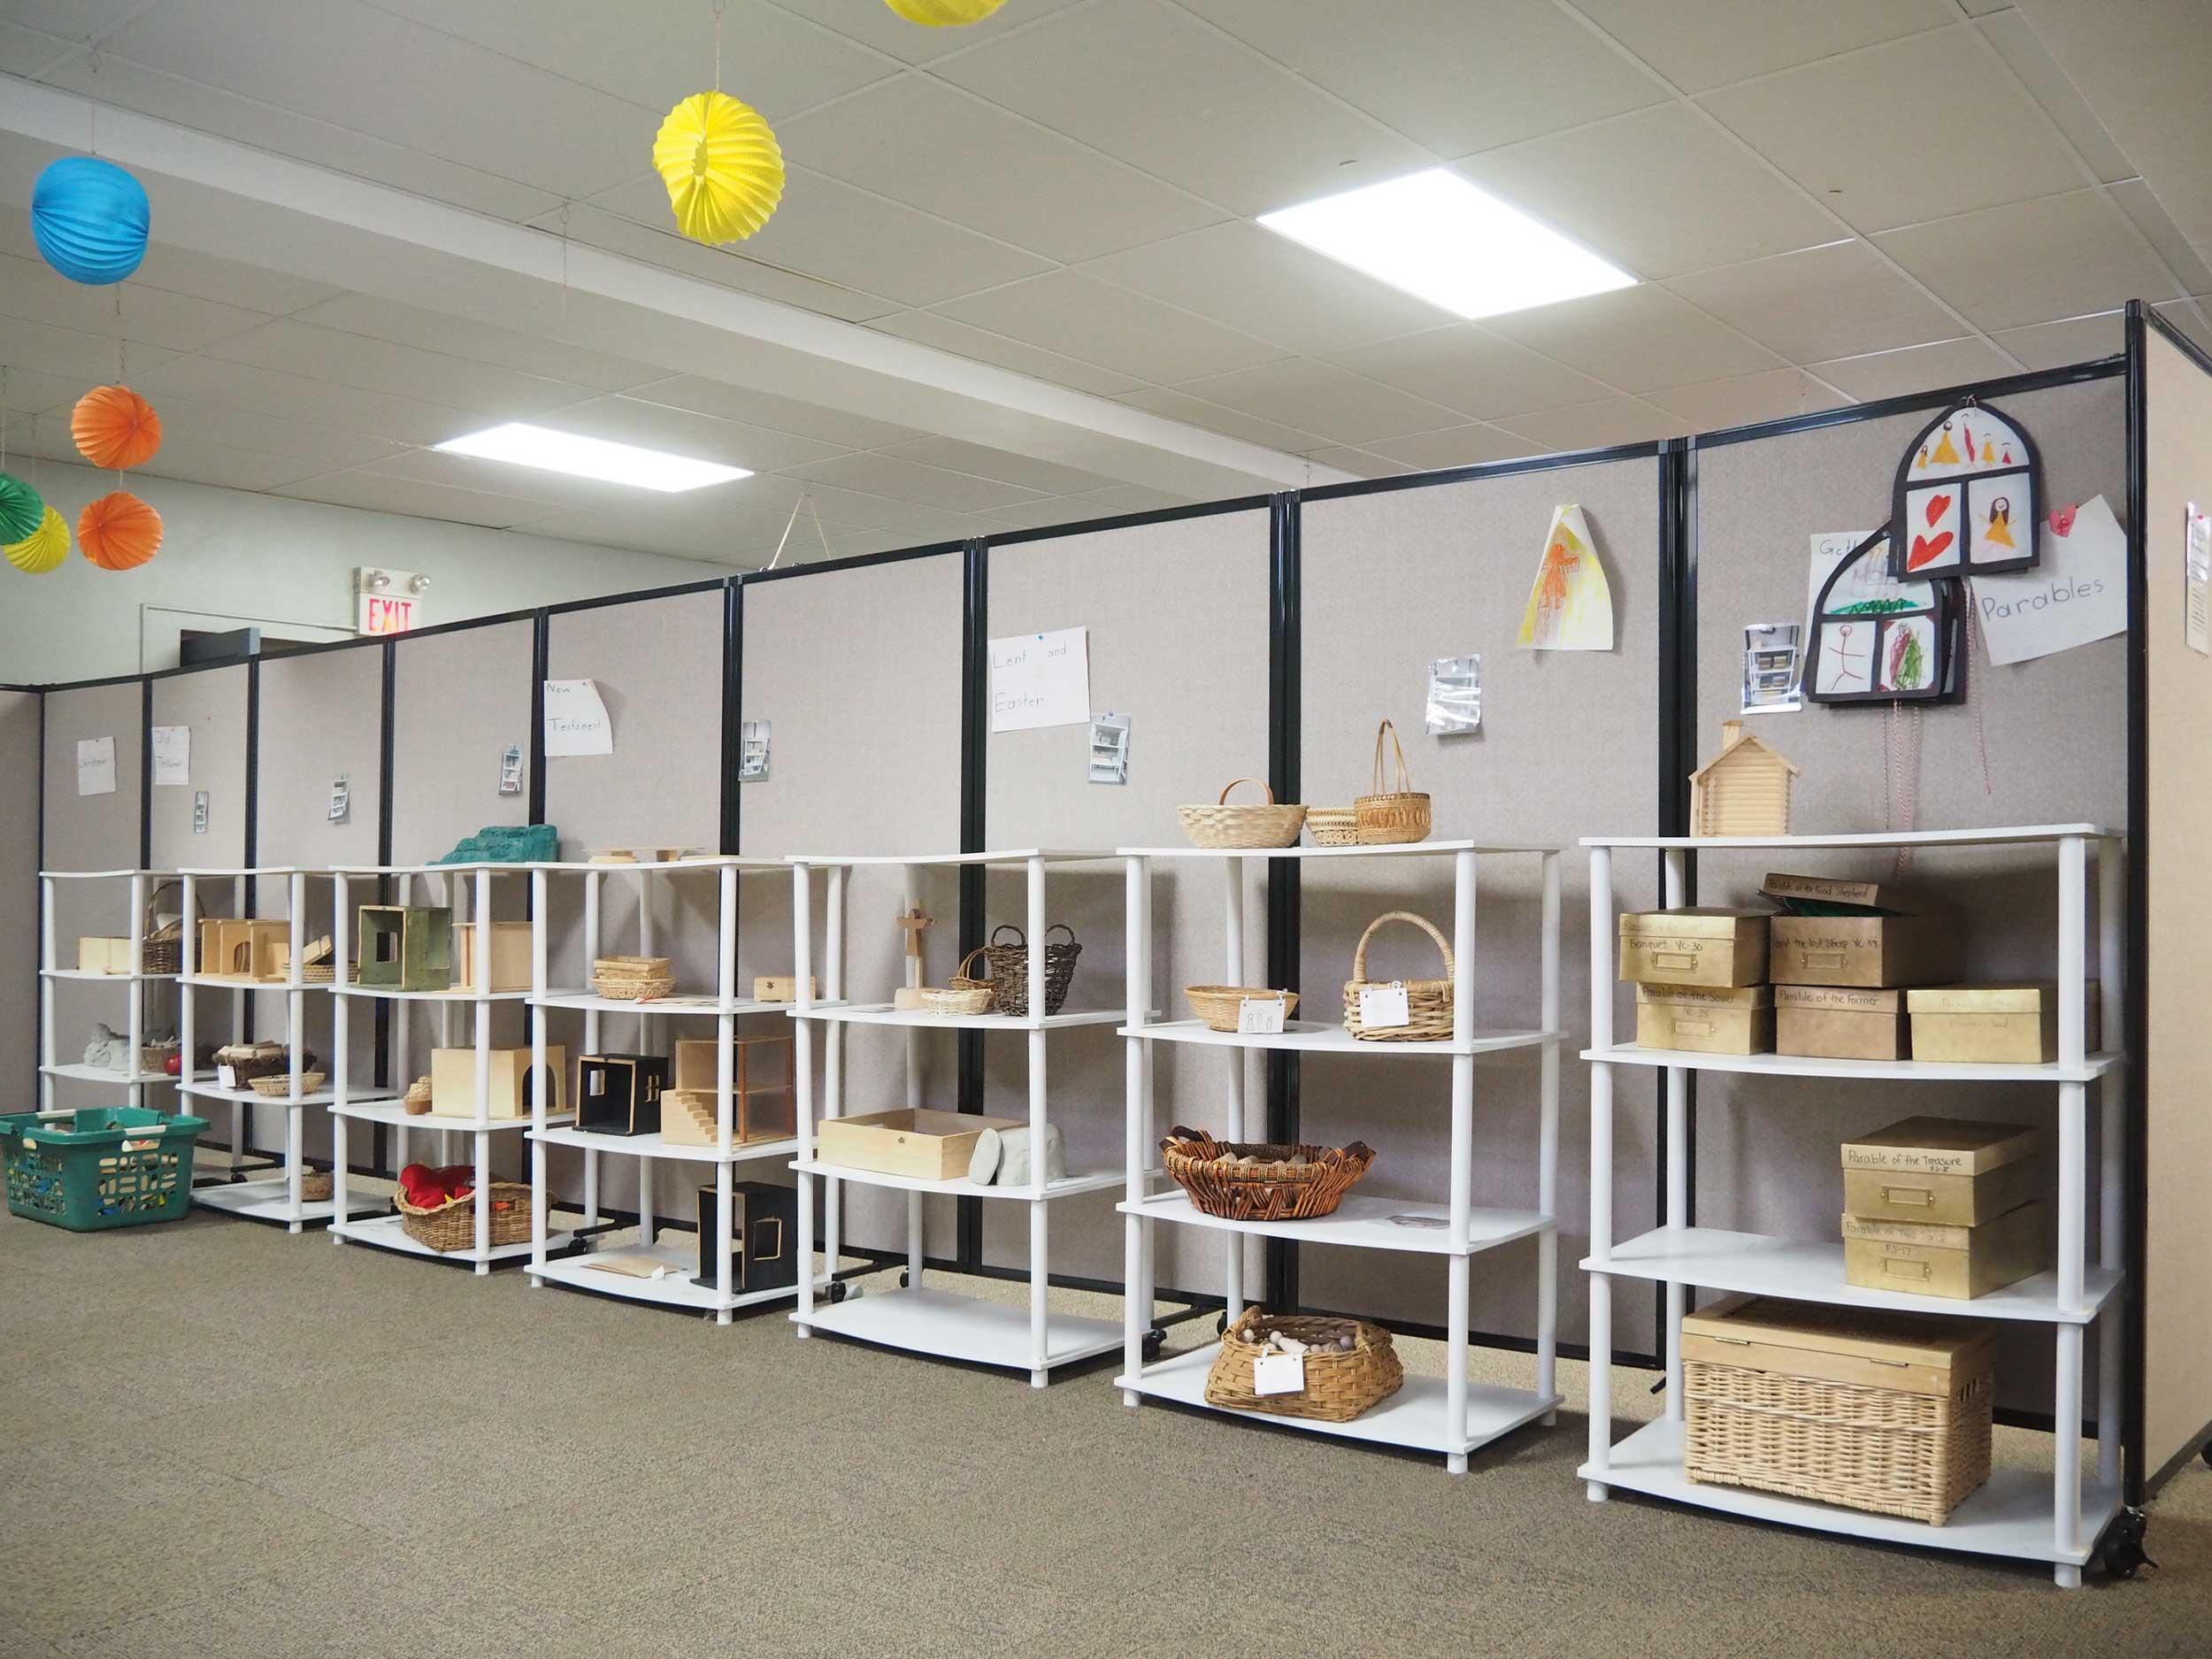 Room Divider Ideas: Creative DIY Separator Wall Layouts